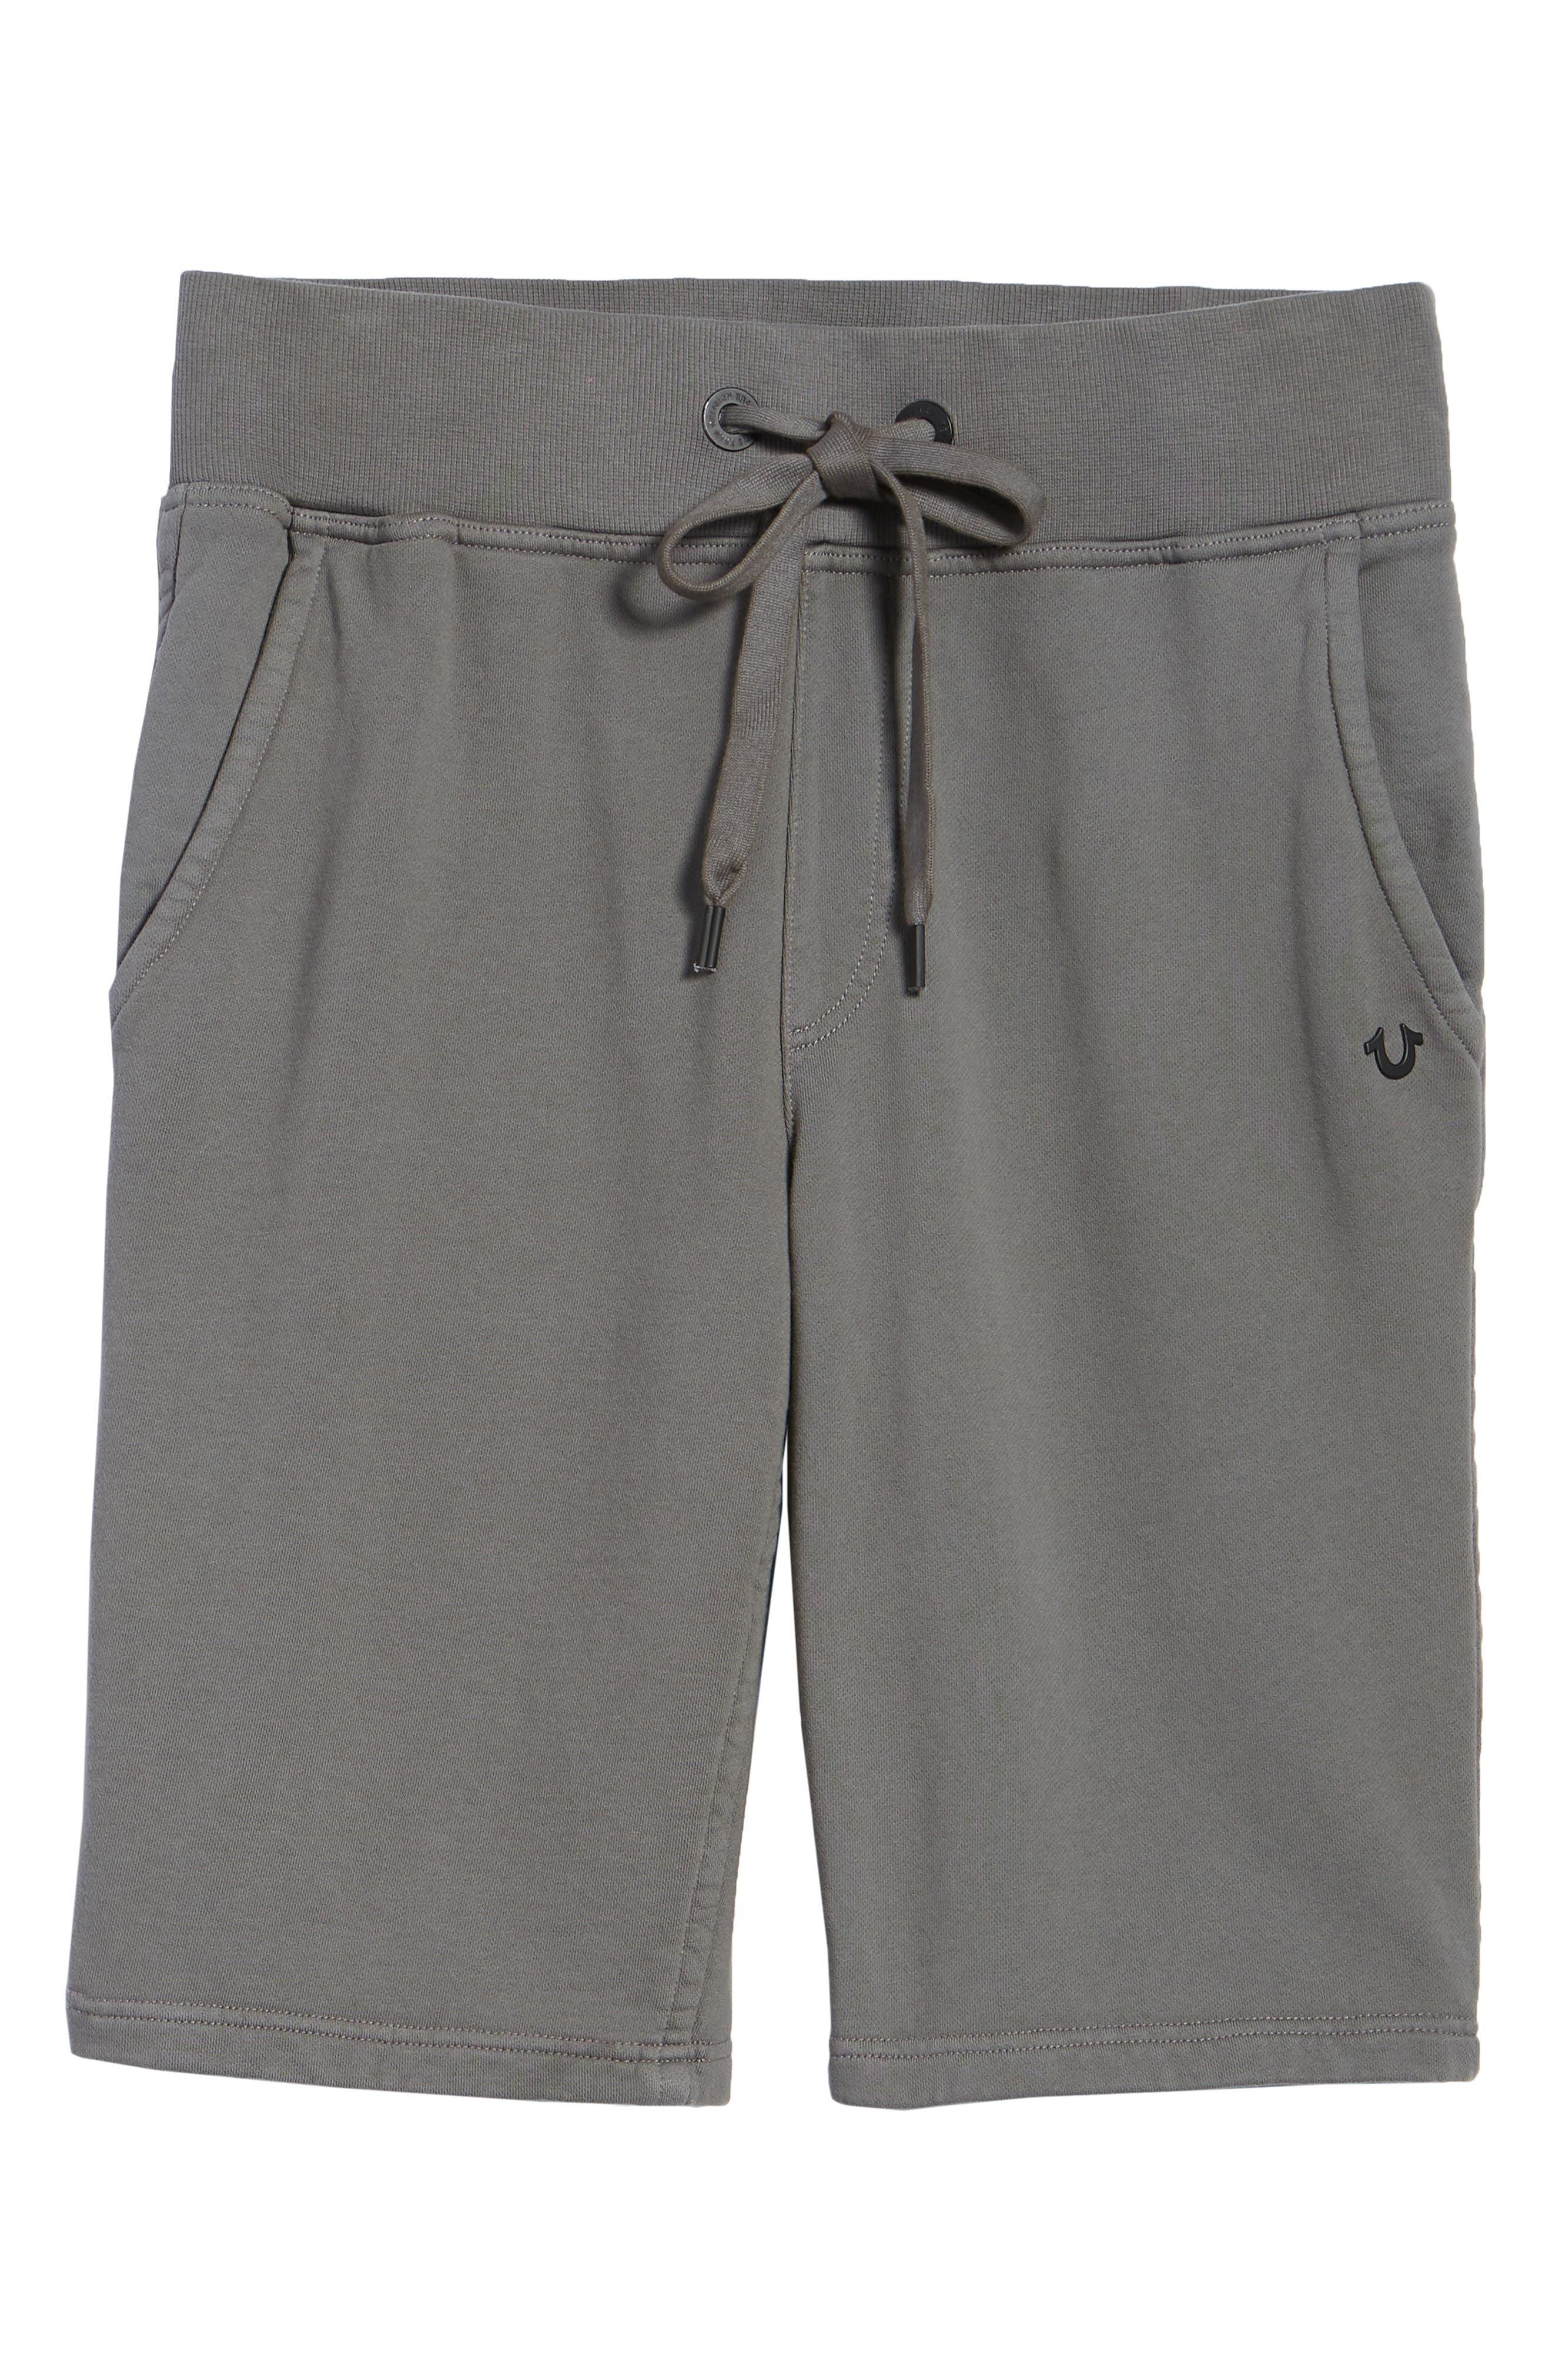 Core Shorts,                             Alternate thumbnail 6, color,                             CHARCOAL